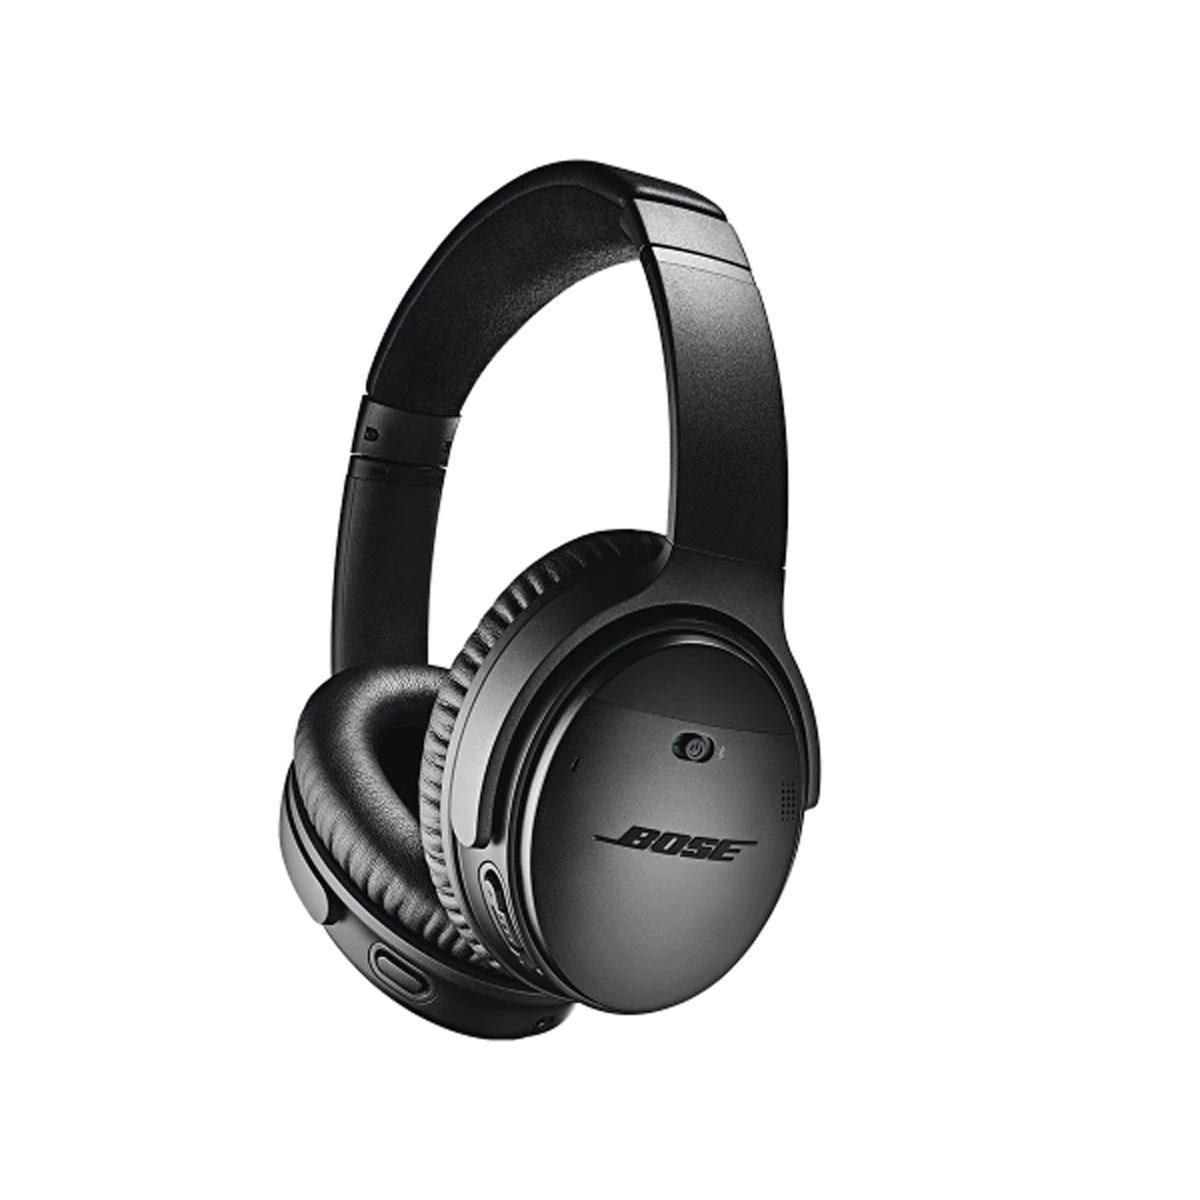 BOSS QC35 SERIES II headphone